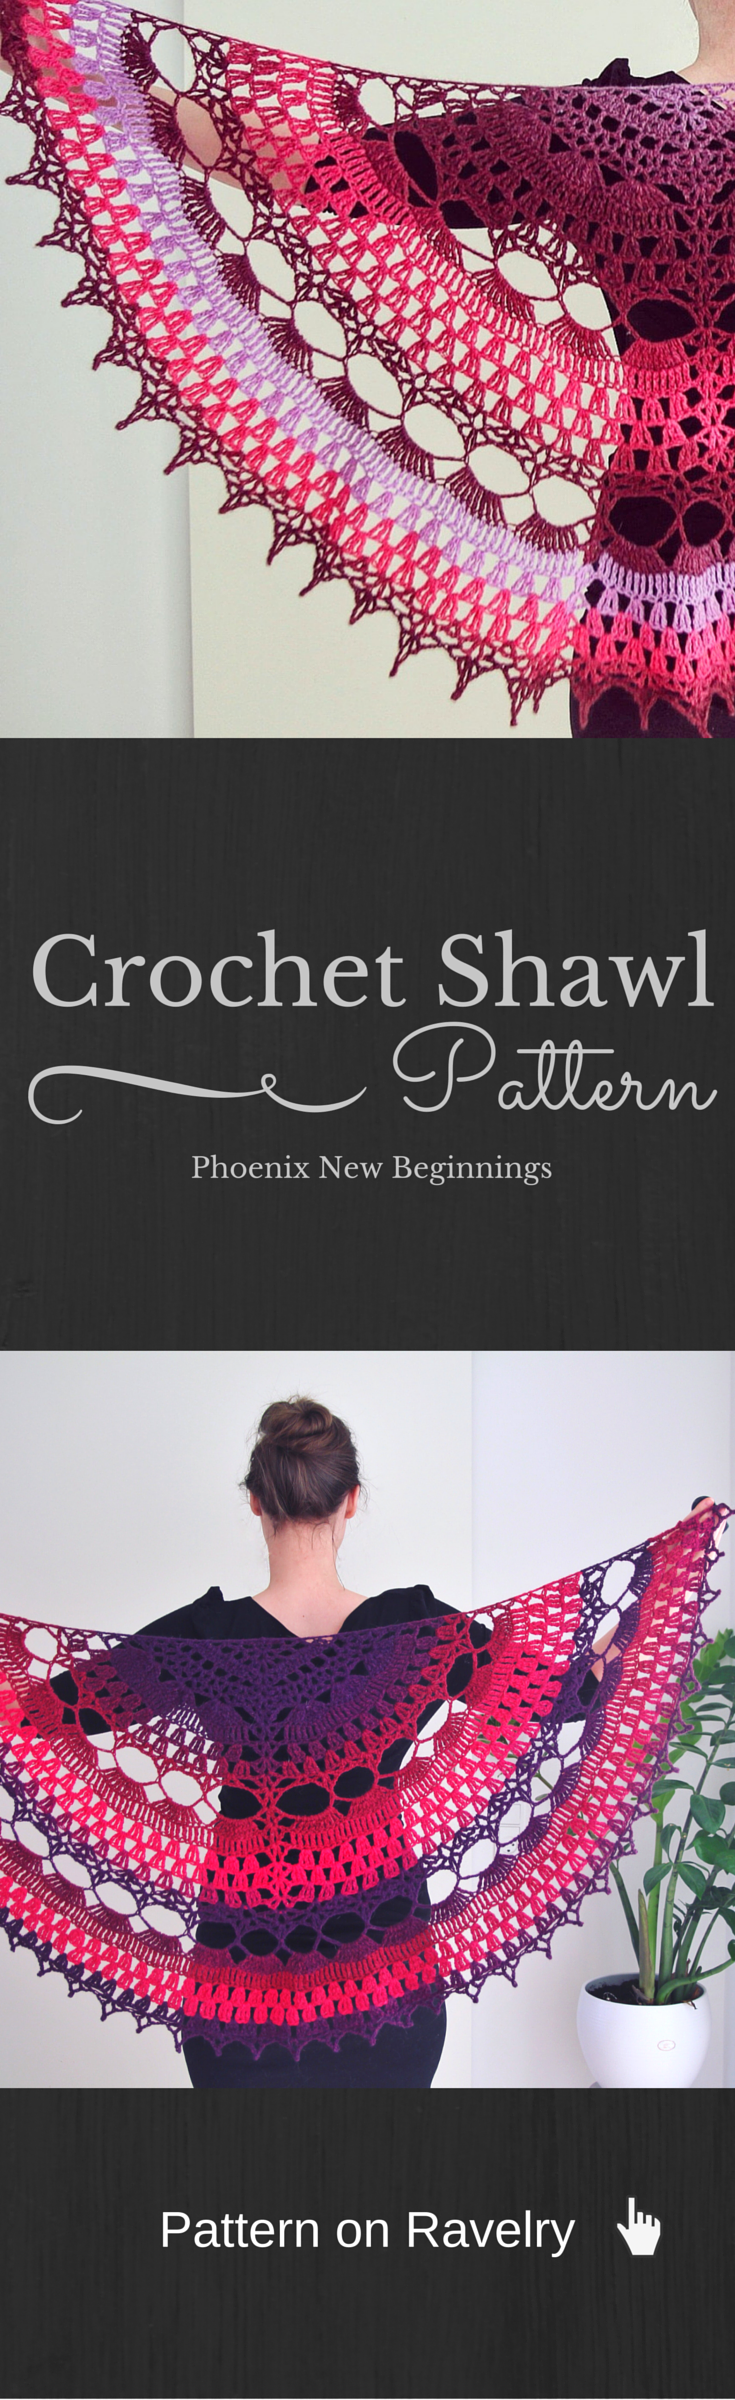 Phoenix New Beginnings pattern by Elena Madsen   Chal, Tejido y Ponchos